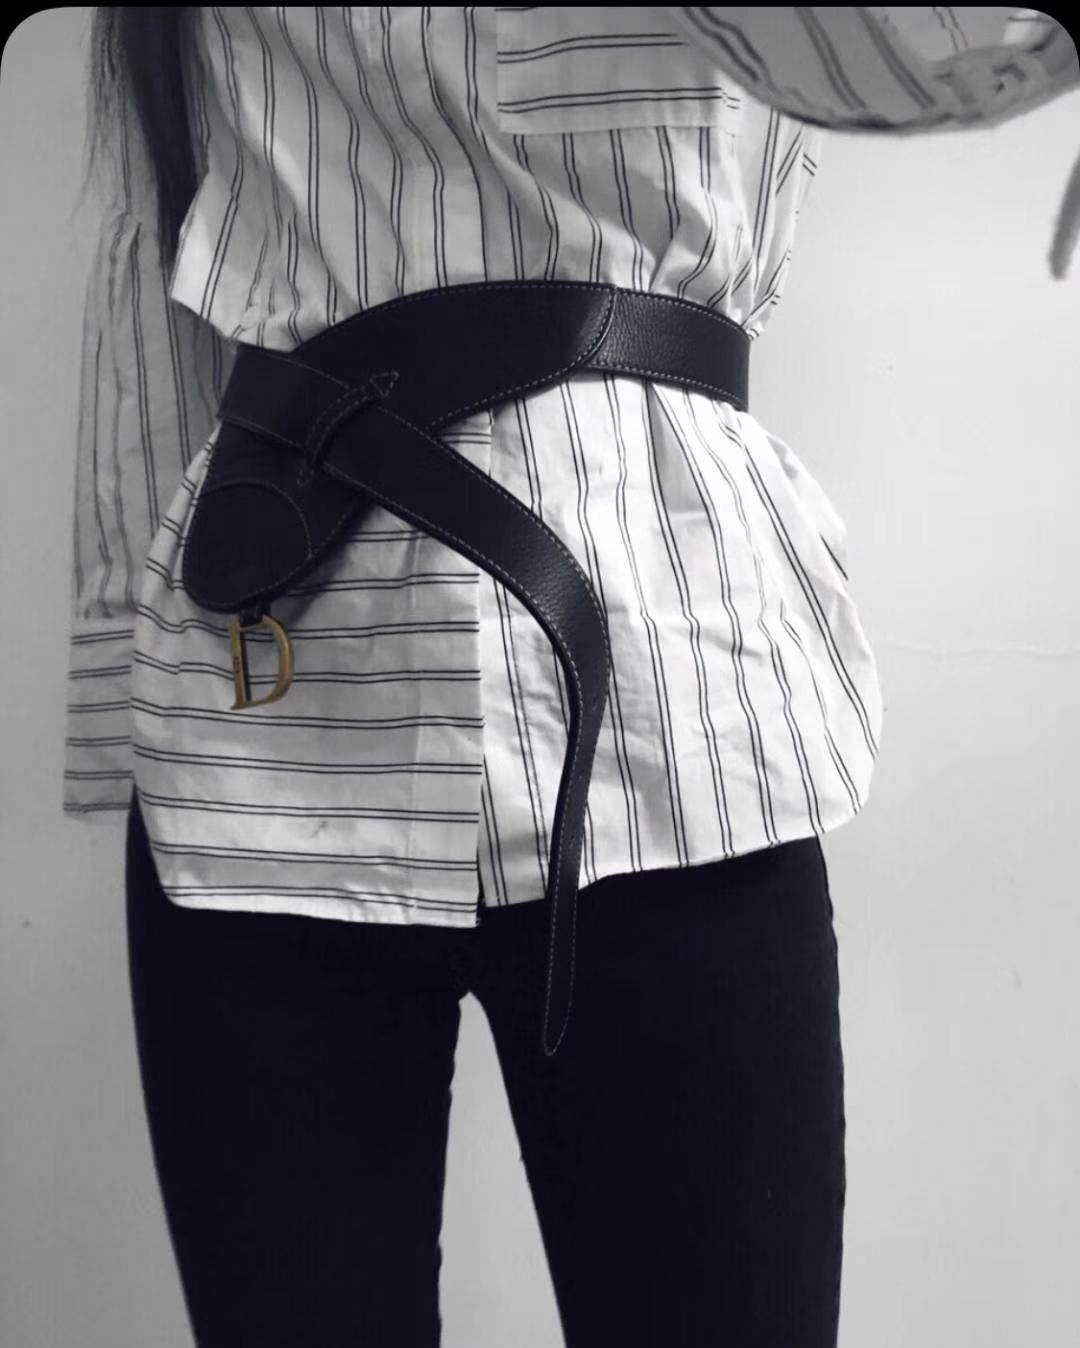 Dior 新款腰包 黑色 进口头层皮 小巧实用款